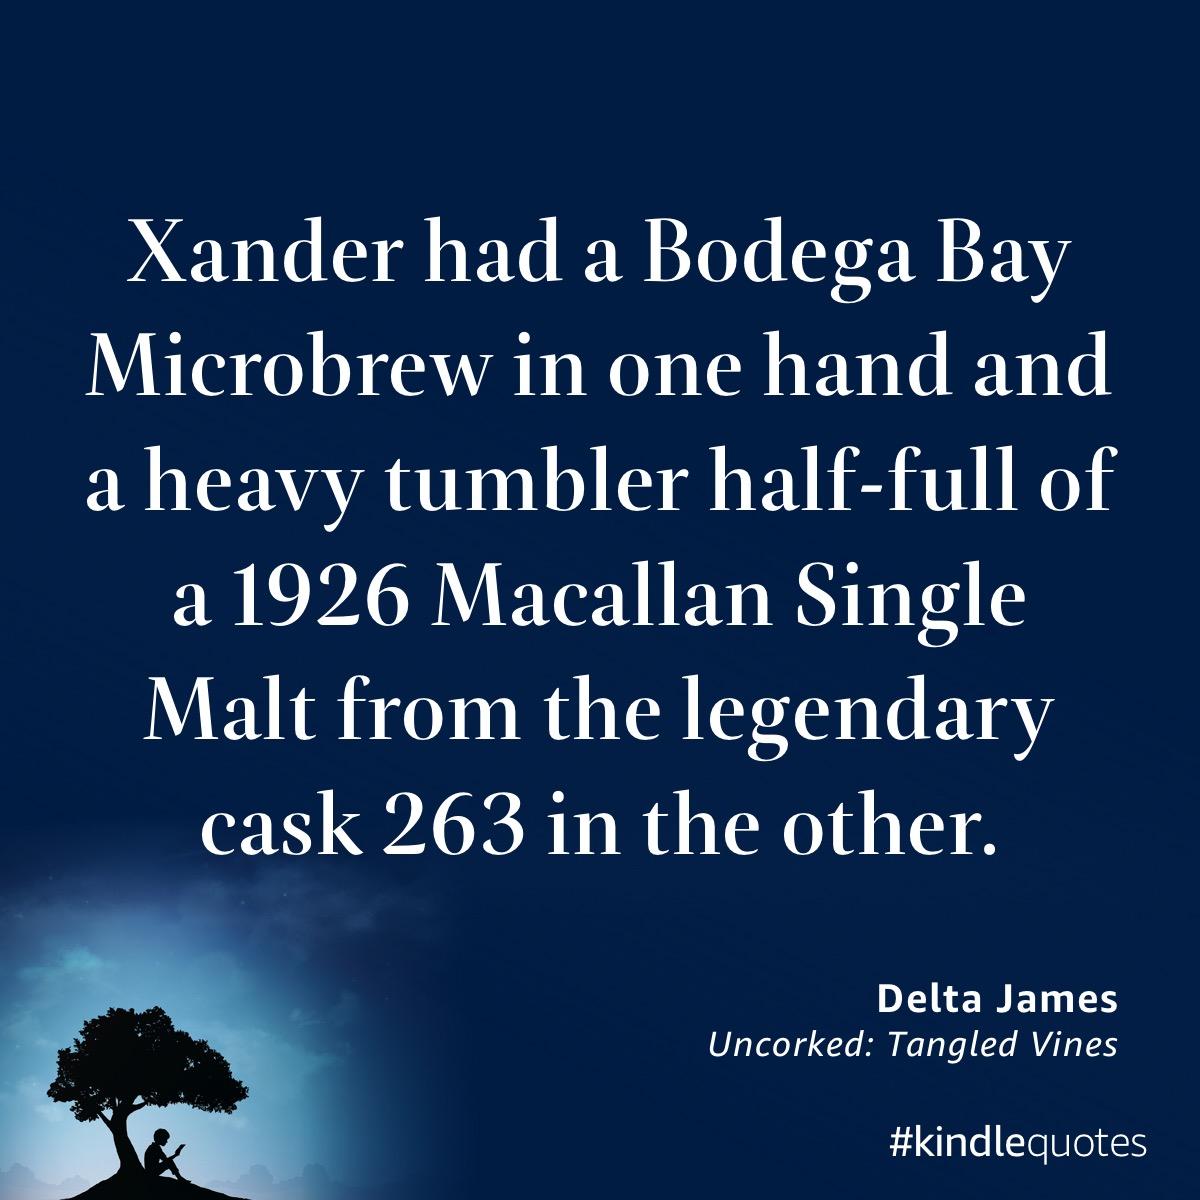 Book quote Delta James